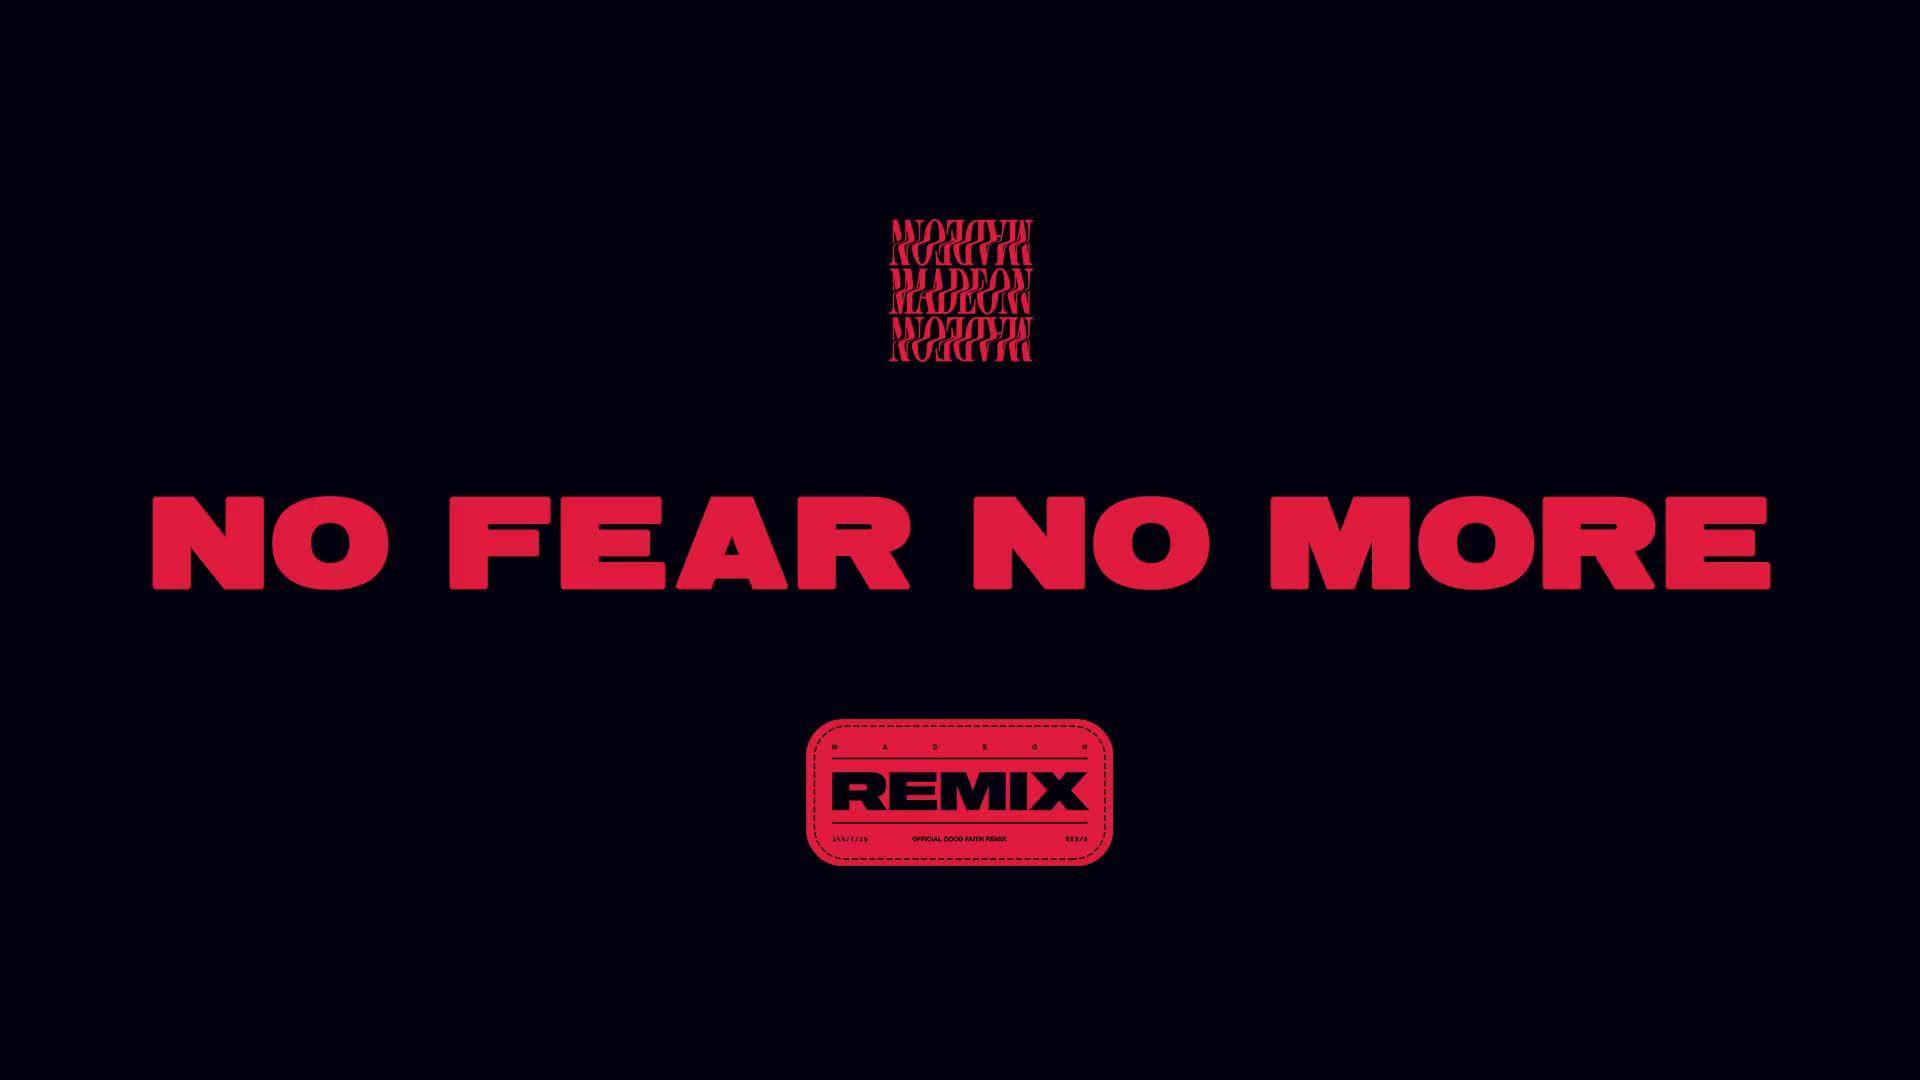 EARTHGANG Remix重混雨果Madeon新单《No Fear No More》官方音频